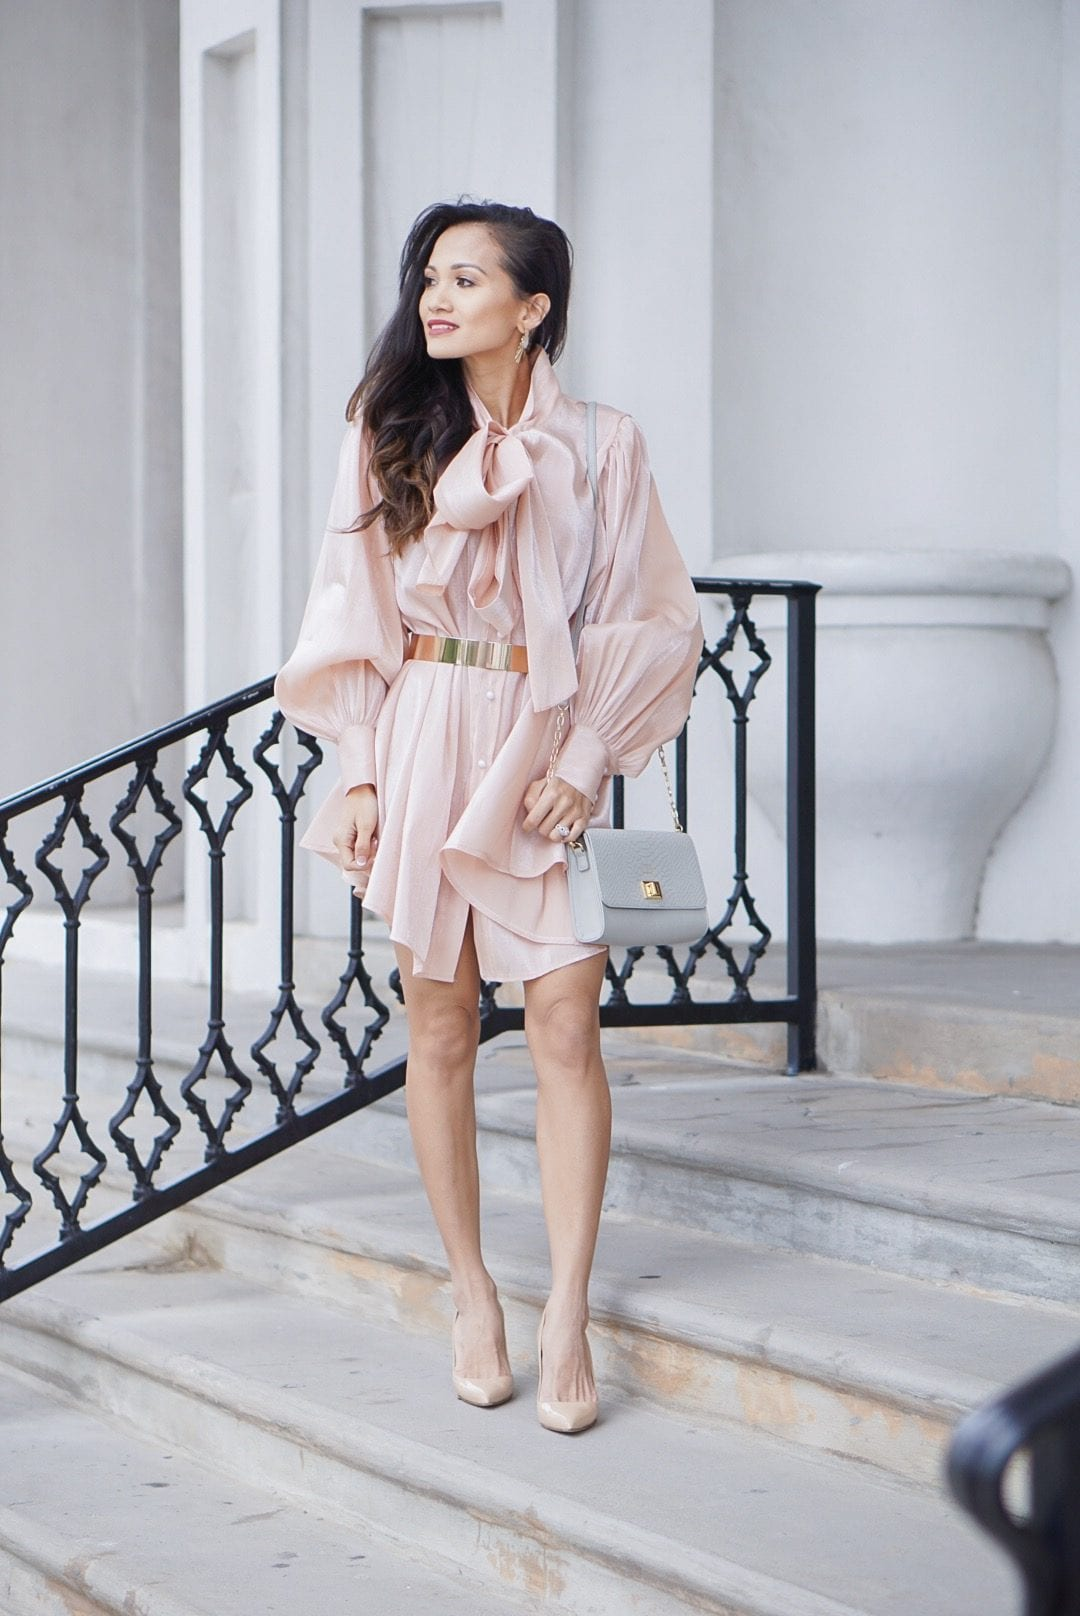 bow tie dress, pink tunic, #workwear, summer style, puff sleeves, Manolo blanik, Kendra Scott earrings, Gigi New York bag, interns, #bloggingtips, blogging tips, hiring interns, interviewing interns